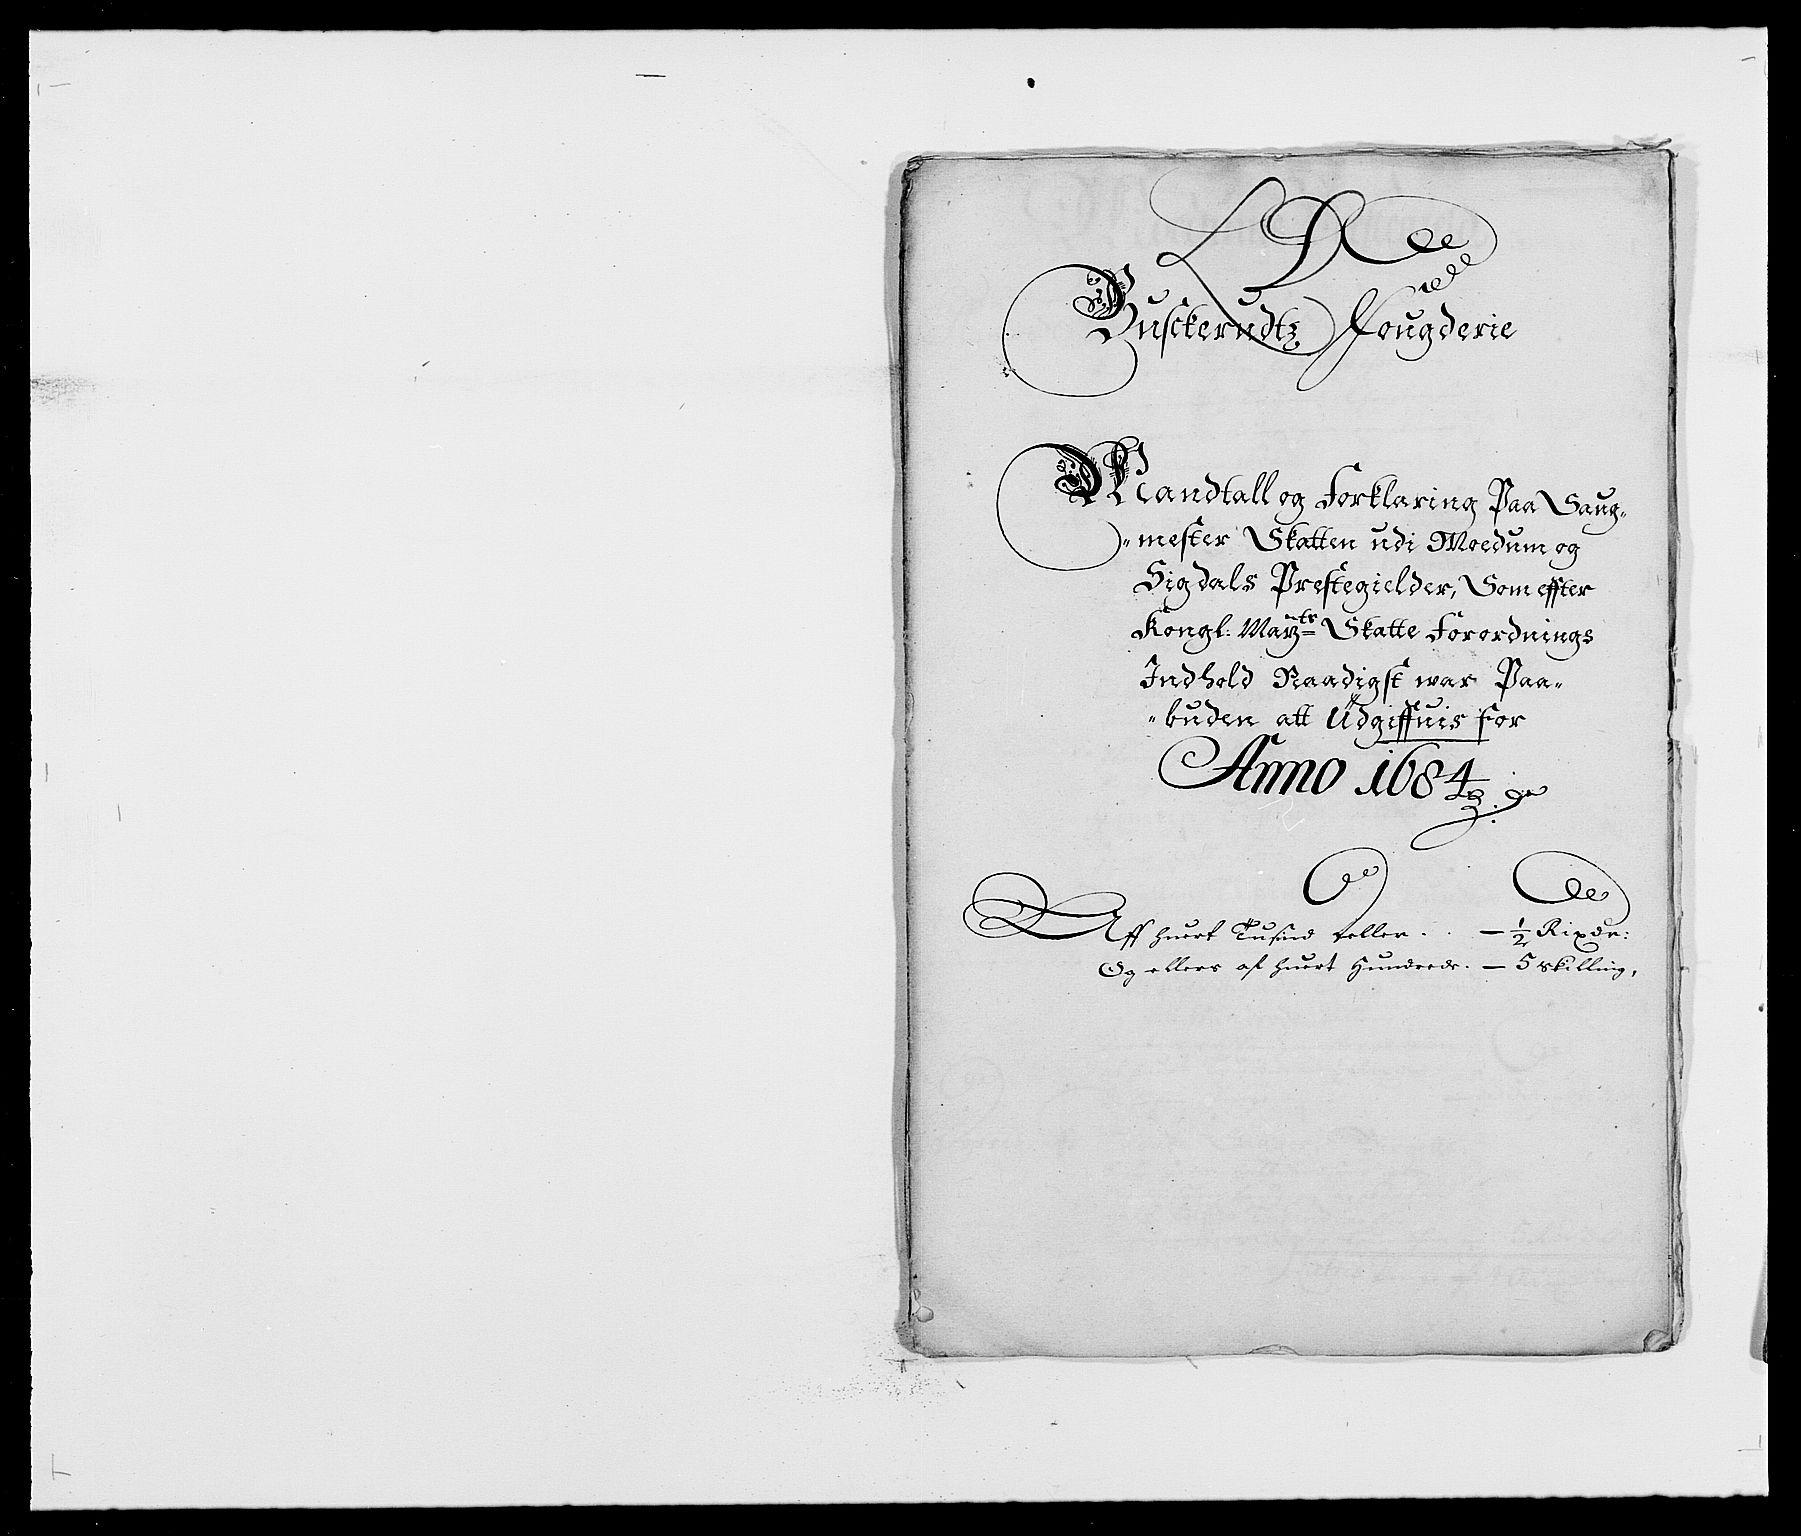 RA, Rentekammeret inntil 1814, Reviderte regnskaper, Fogderegnskap, R25/L1677: Fogderegnskap Buskerud, 1683-1684, s. 295